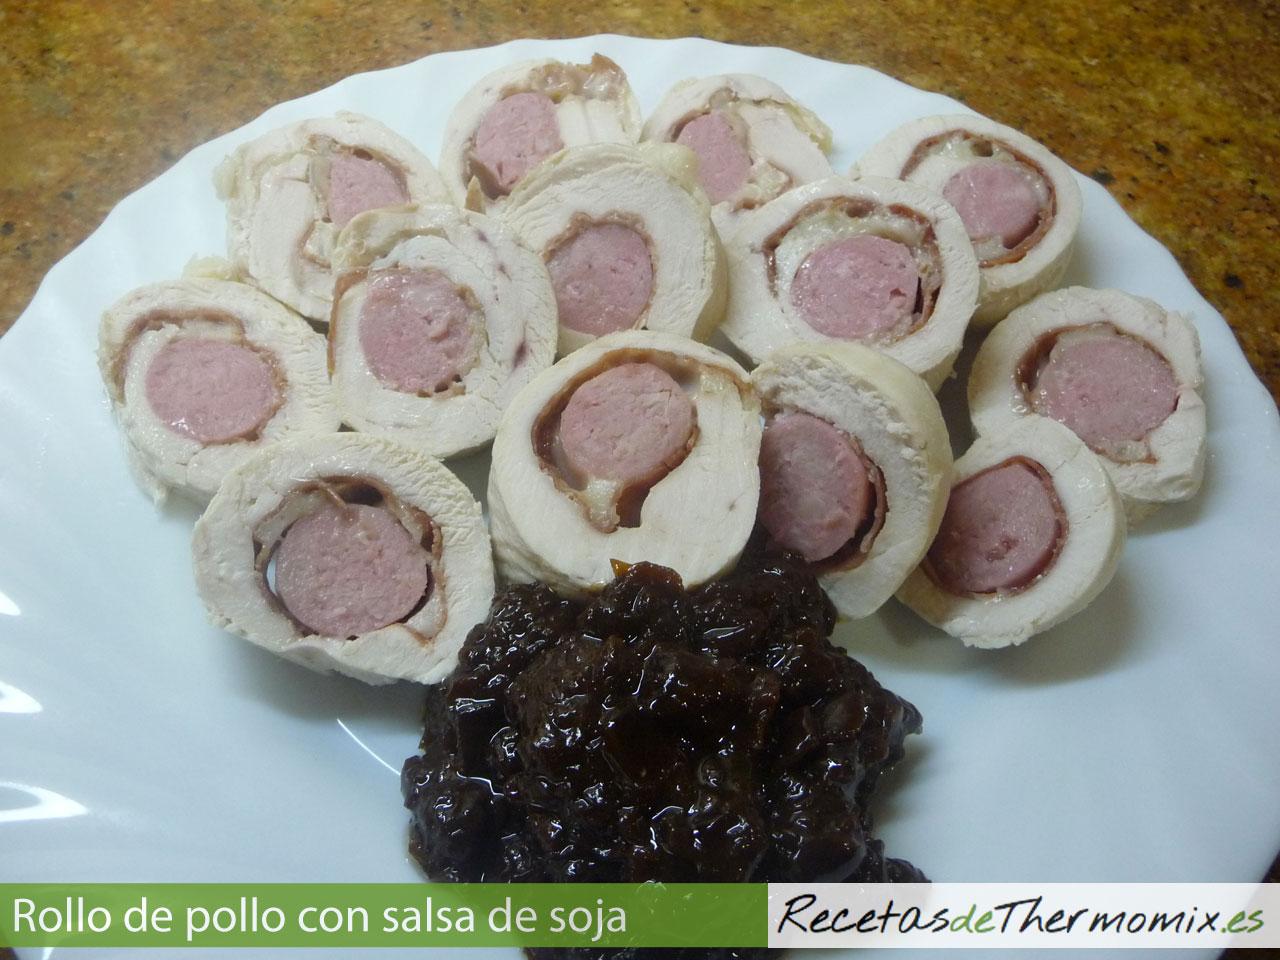 Rollo de pollo con salsa de soja en Thermomix